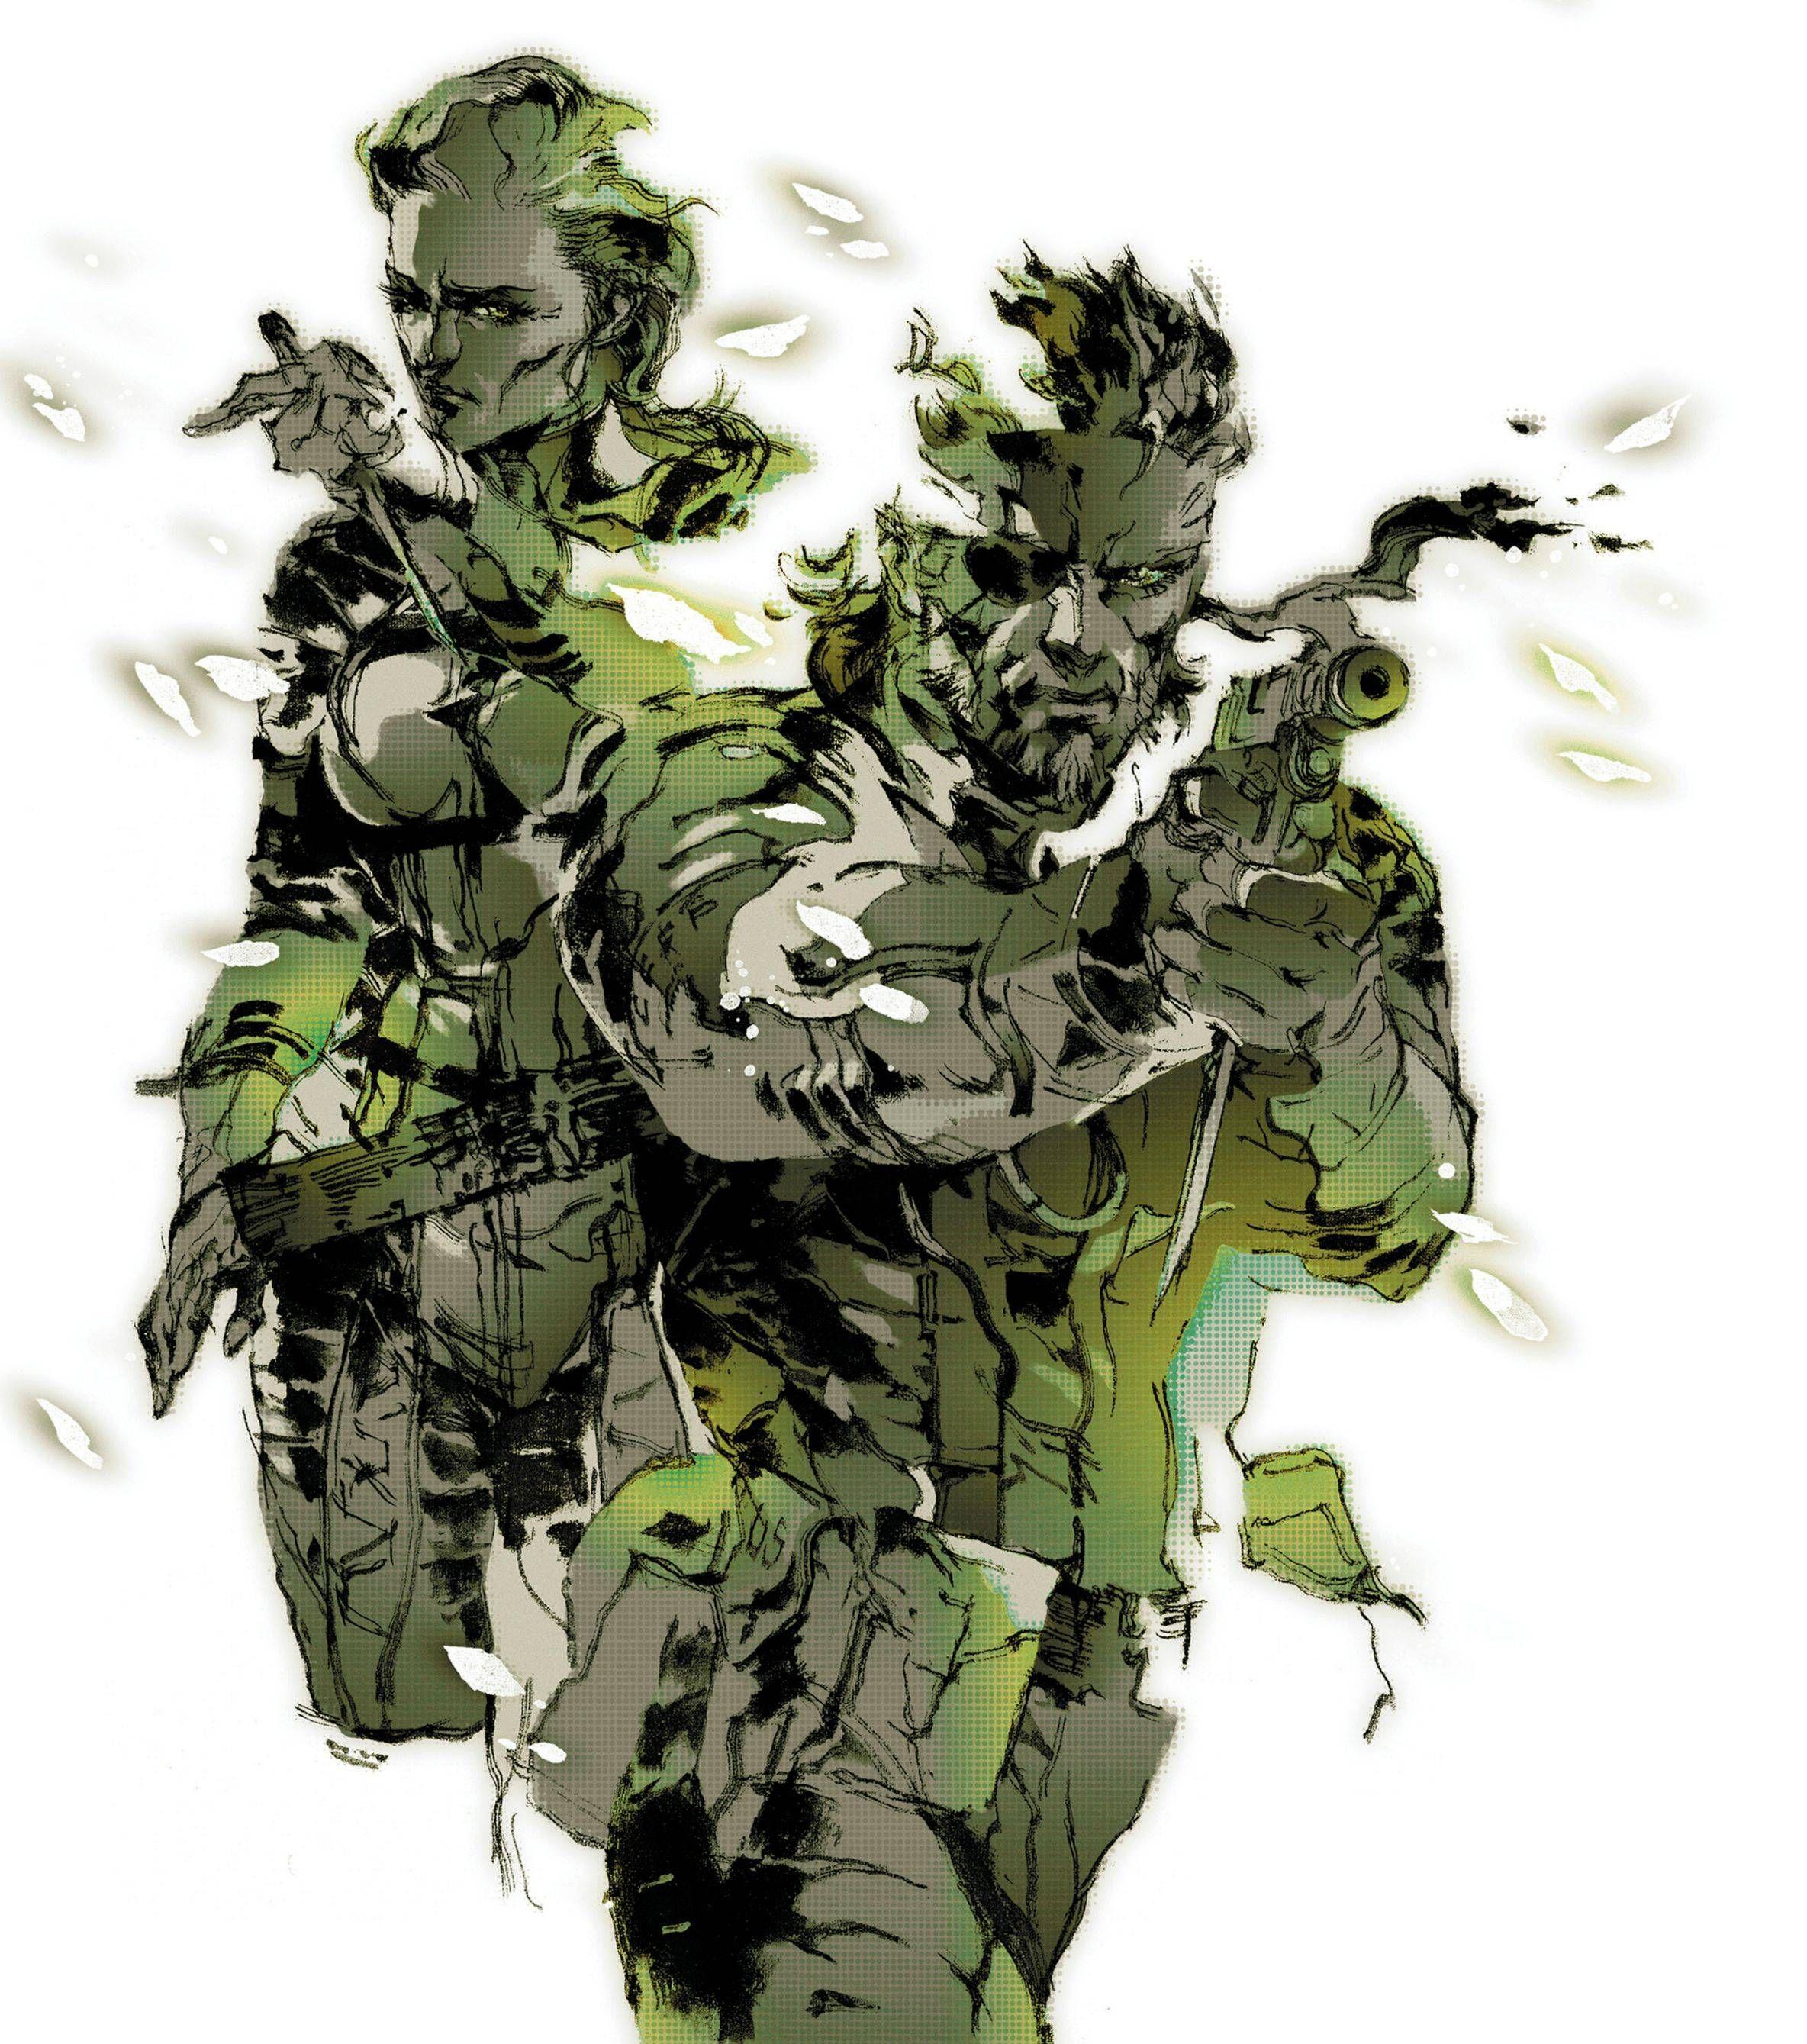 Metal Gear Solid 3 Metal Gear Snake Metal Gear Metal